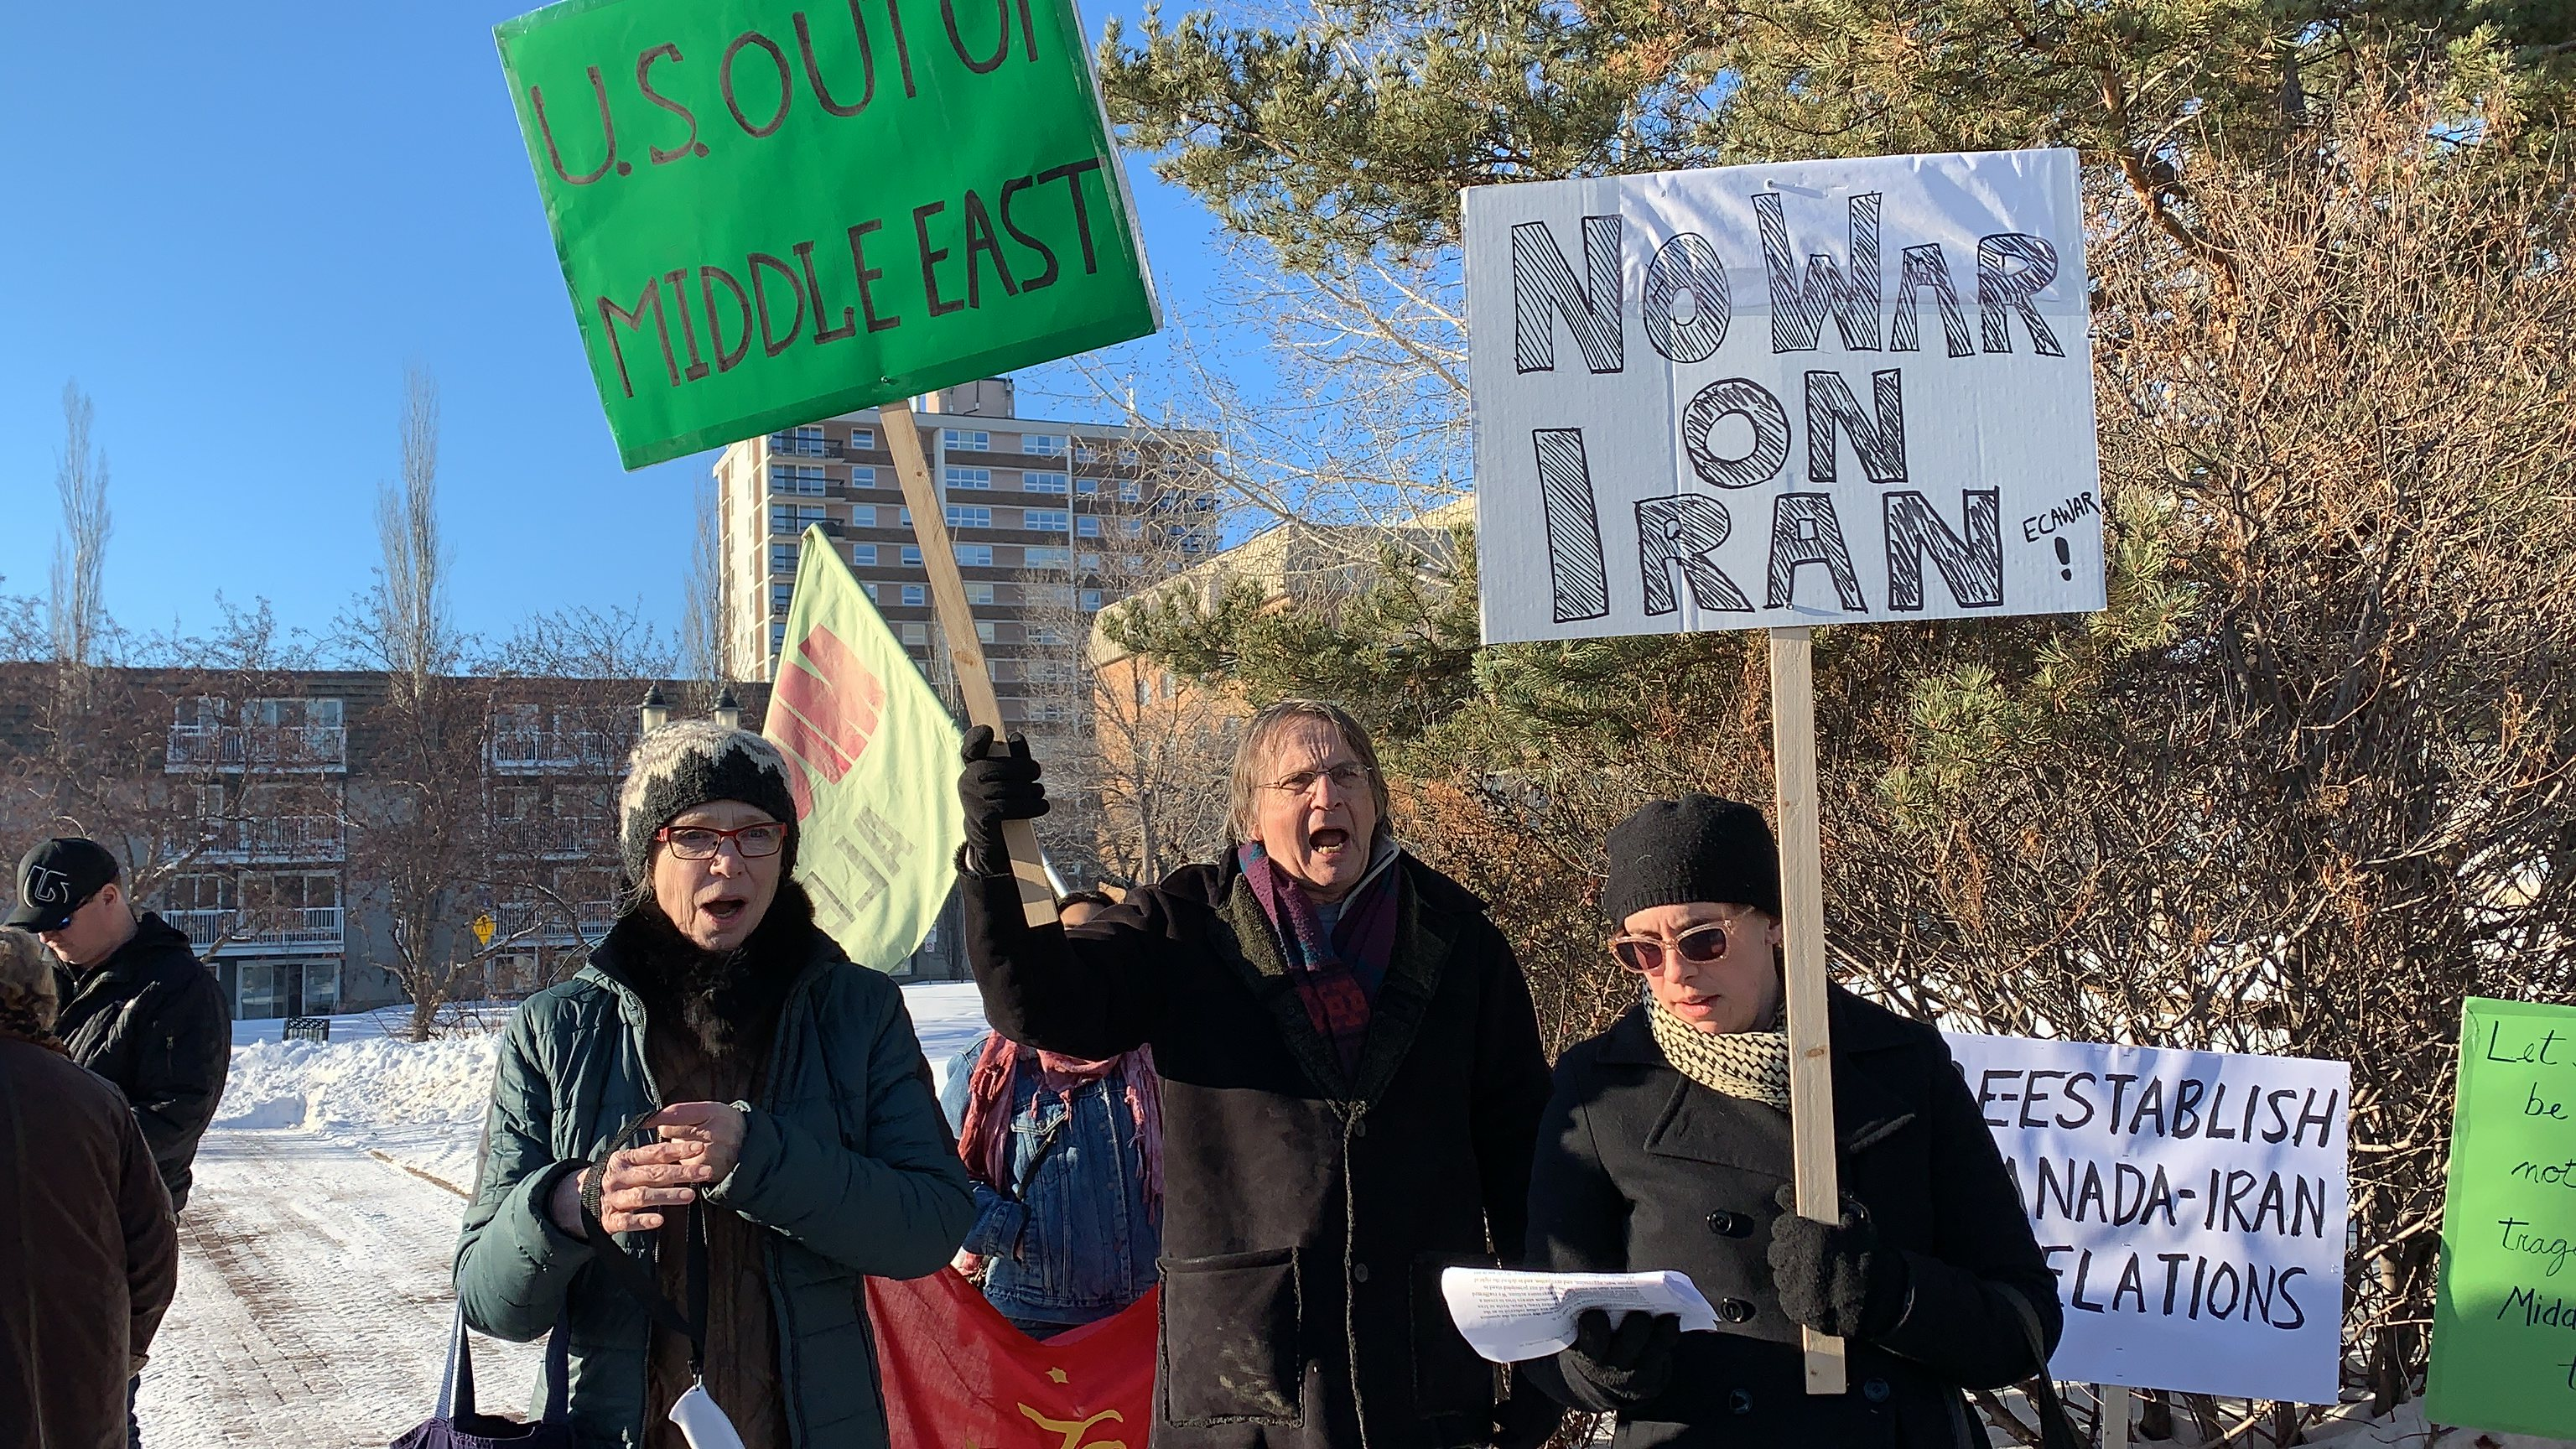 No War On Iran - Global Day of Action - Edmonton